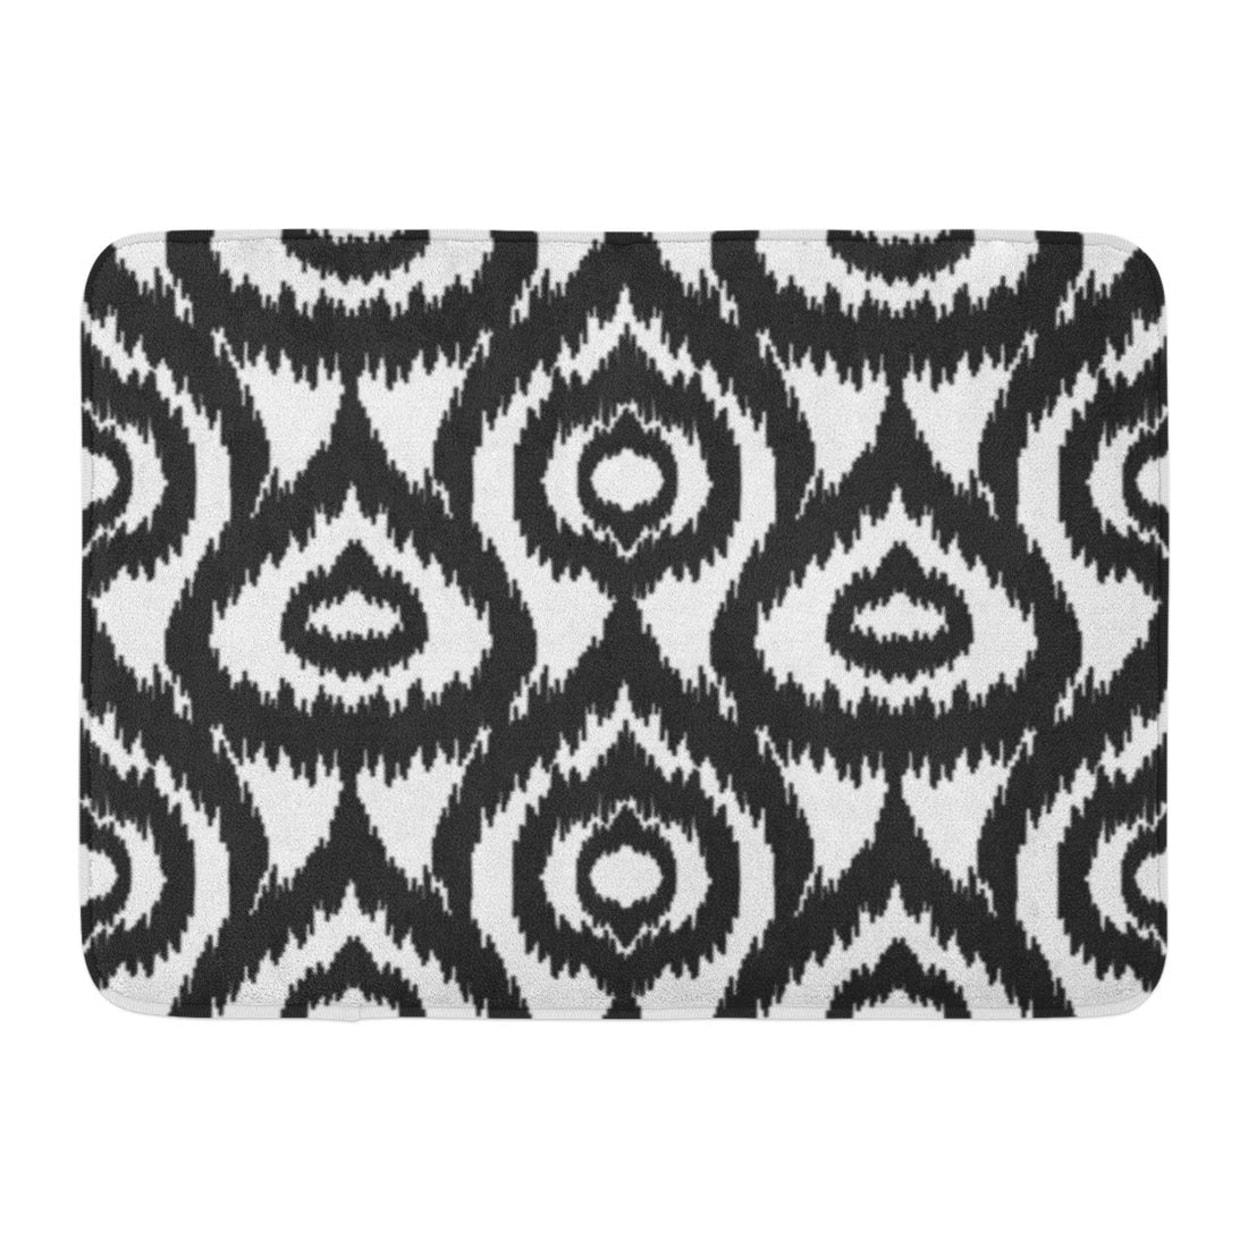 Ikat Black And Pattern Boho Geometric Abstract Drops Uzbek Accessory Doormat Floor Rug Bath Mat 23 6x15 7 Inch Multi On Sale Overstock 31779733